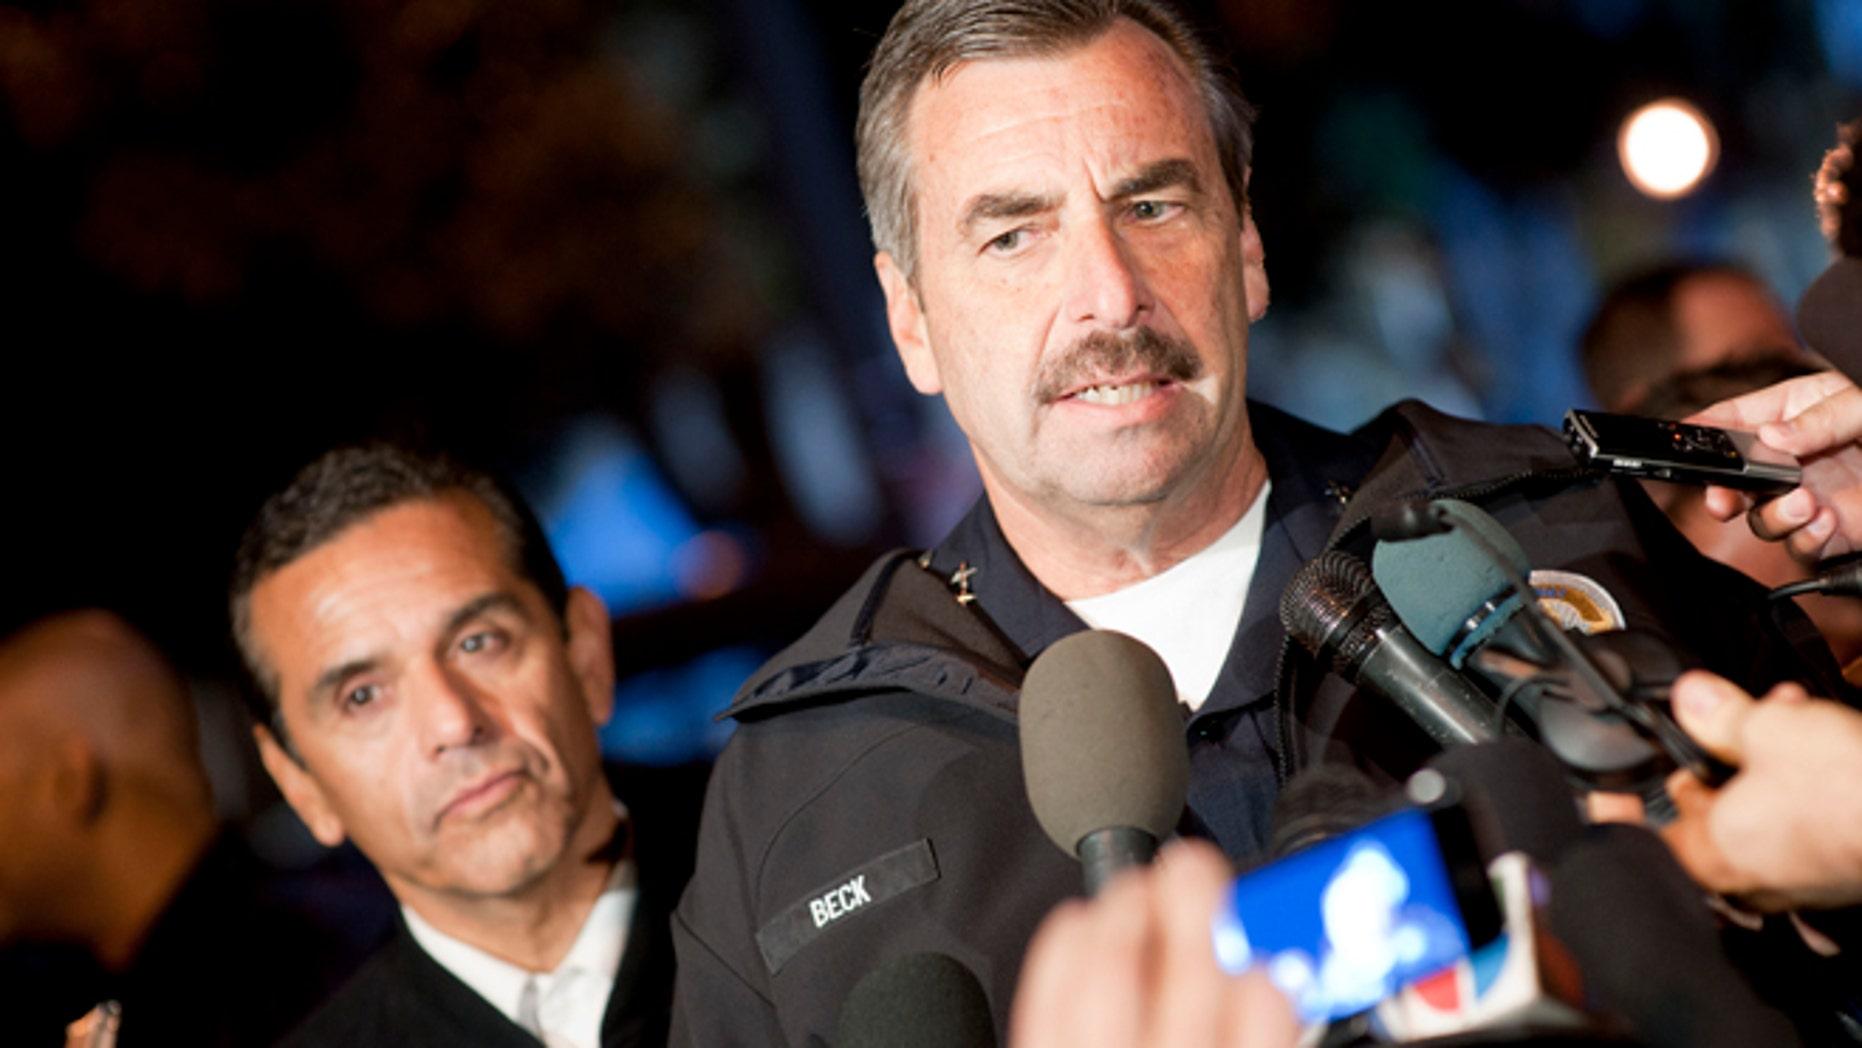 Los Angeles Police Department Chief Charlie Beck talks to members of the media. Behind him is Los Angeles Mayor Antonio Villaraigosa.